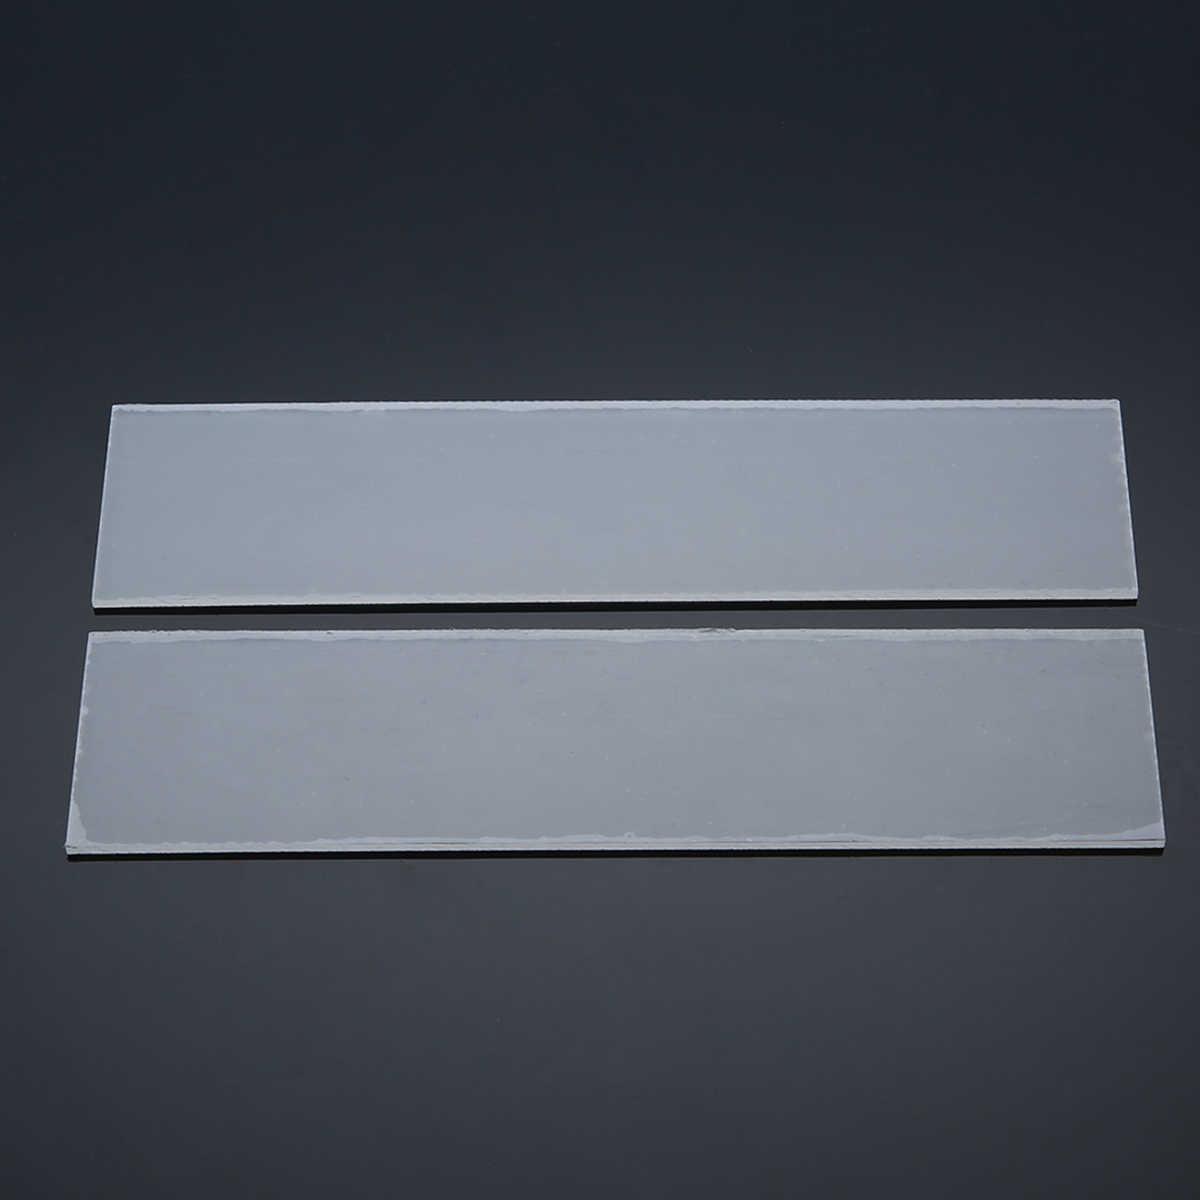 Generic Acrylic Cutting Plates